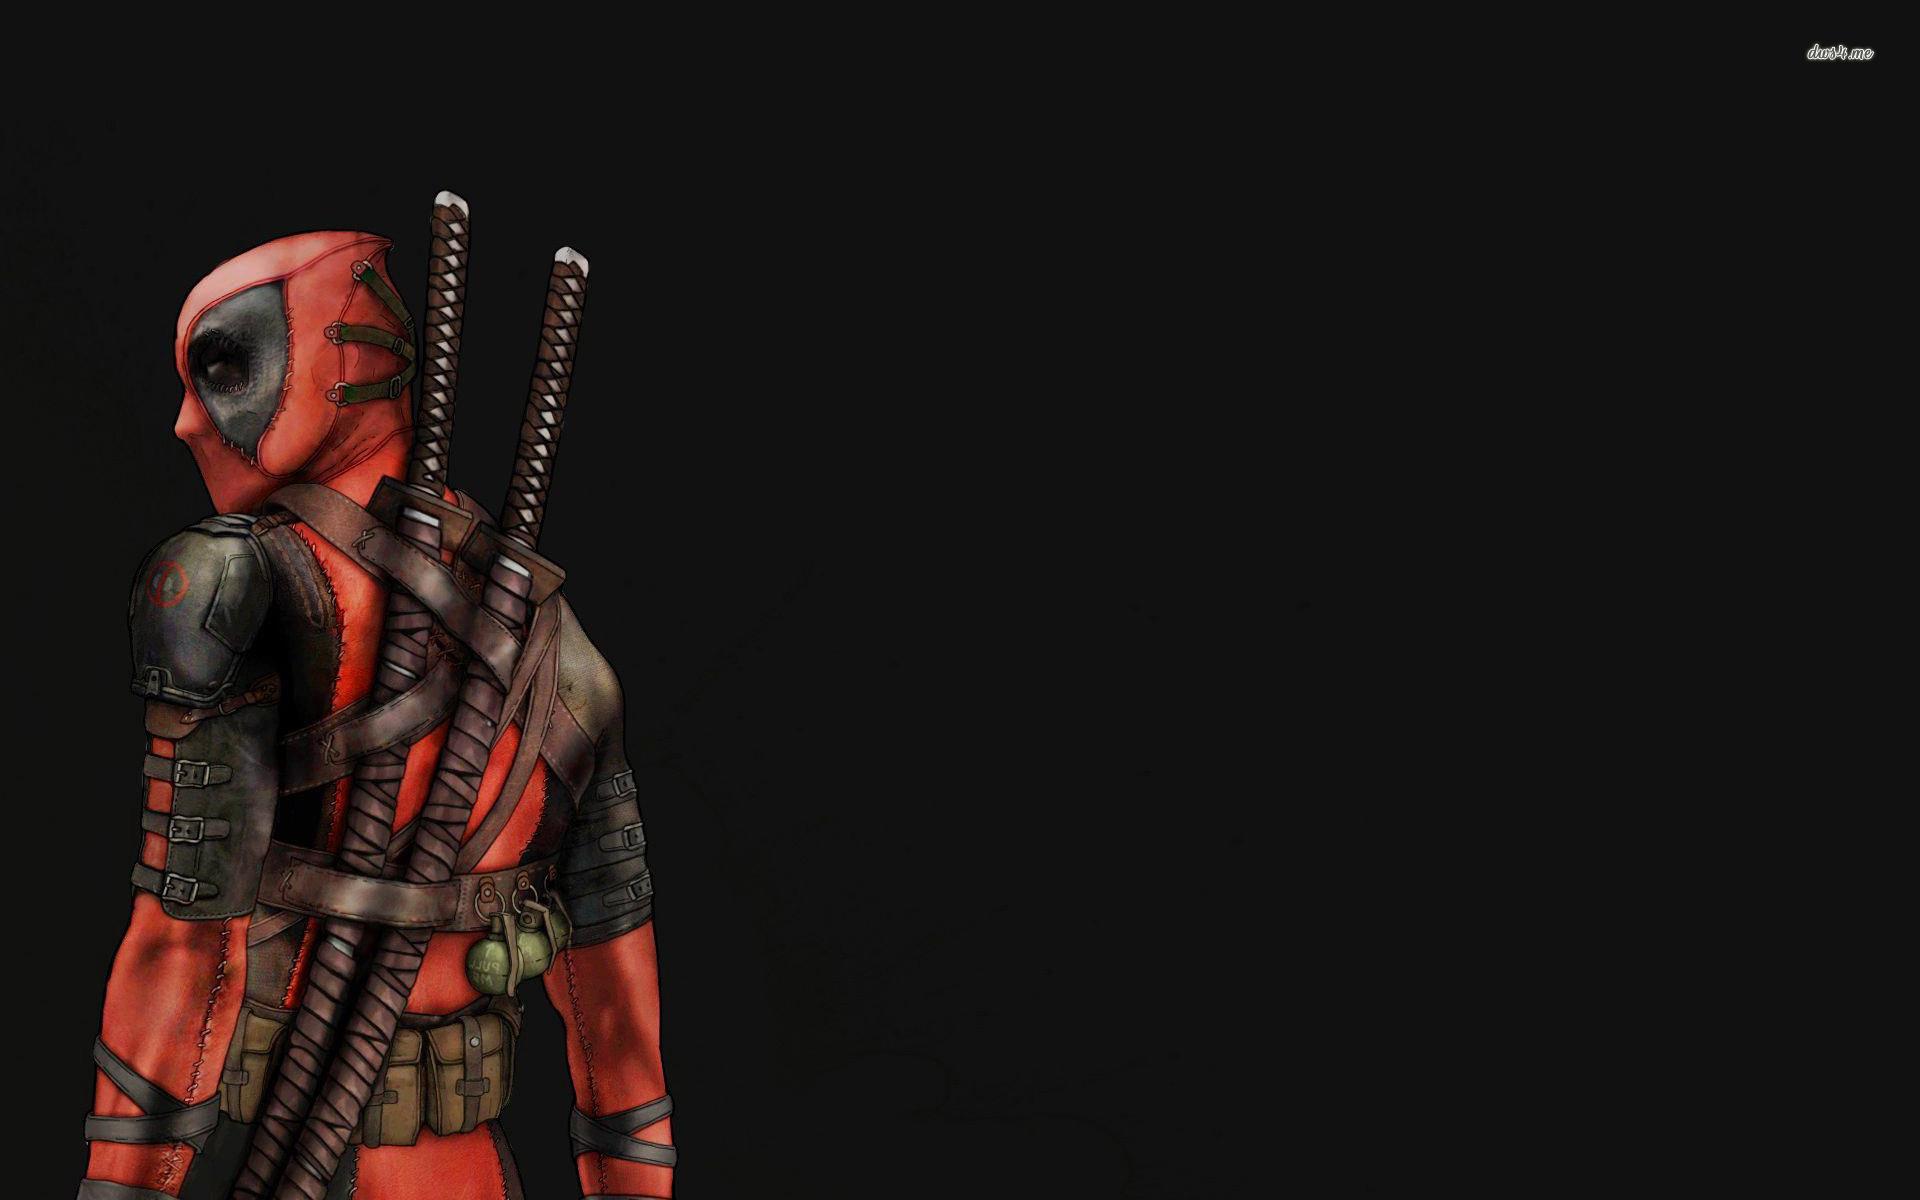 43+ Deadpool 4K Wallpaper on WallpaperSafari